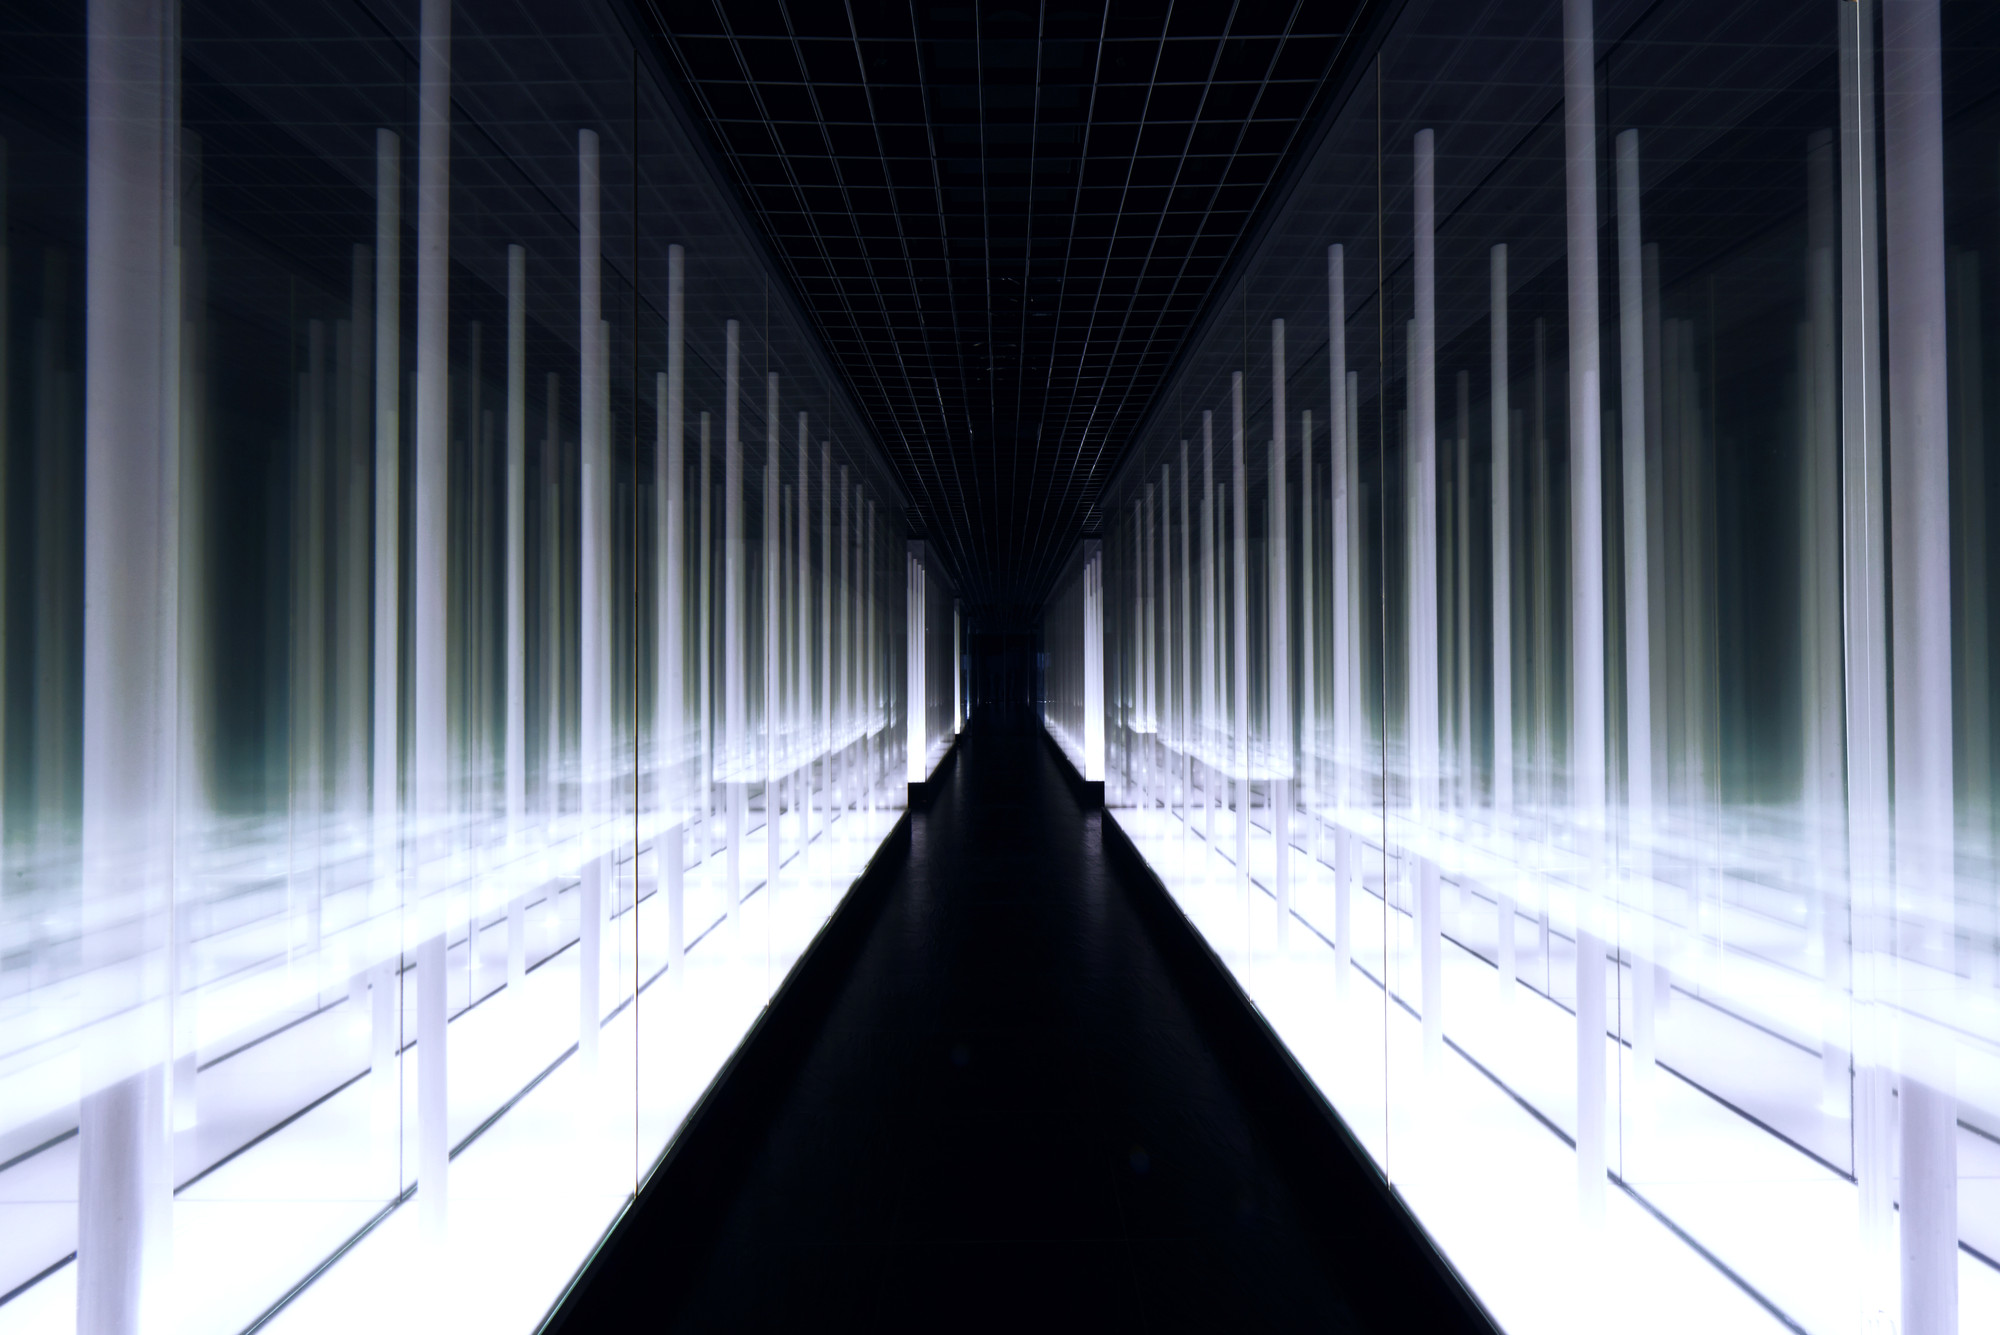 Instalación de luz: Infinity Bamboo Forest por PRISM DESIGN, Courtesy of PRISM DESIGN